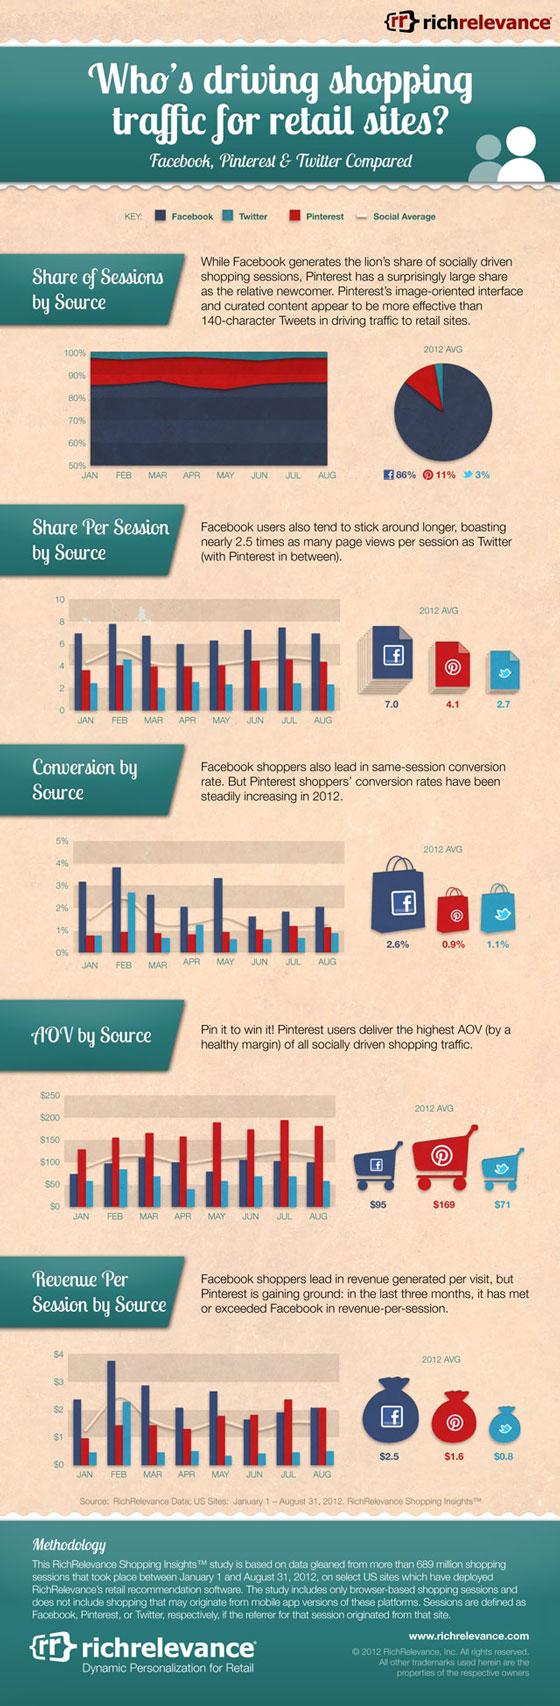 RichRelevance-social-media-e-commerce-infographie